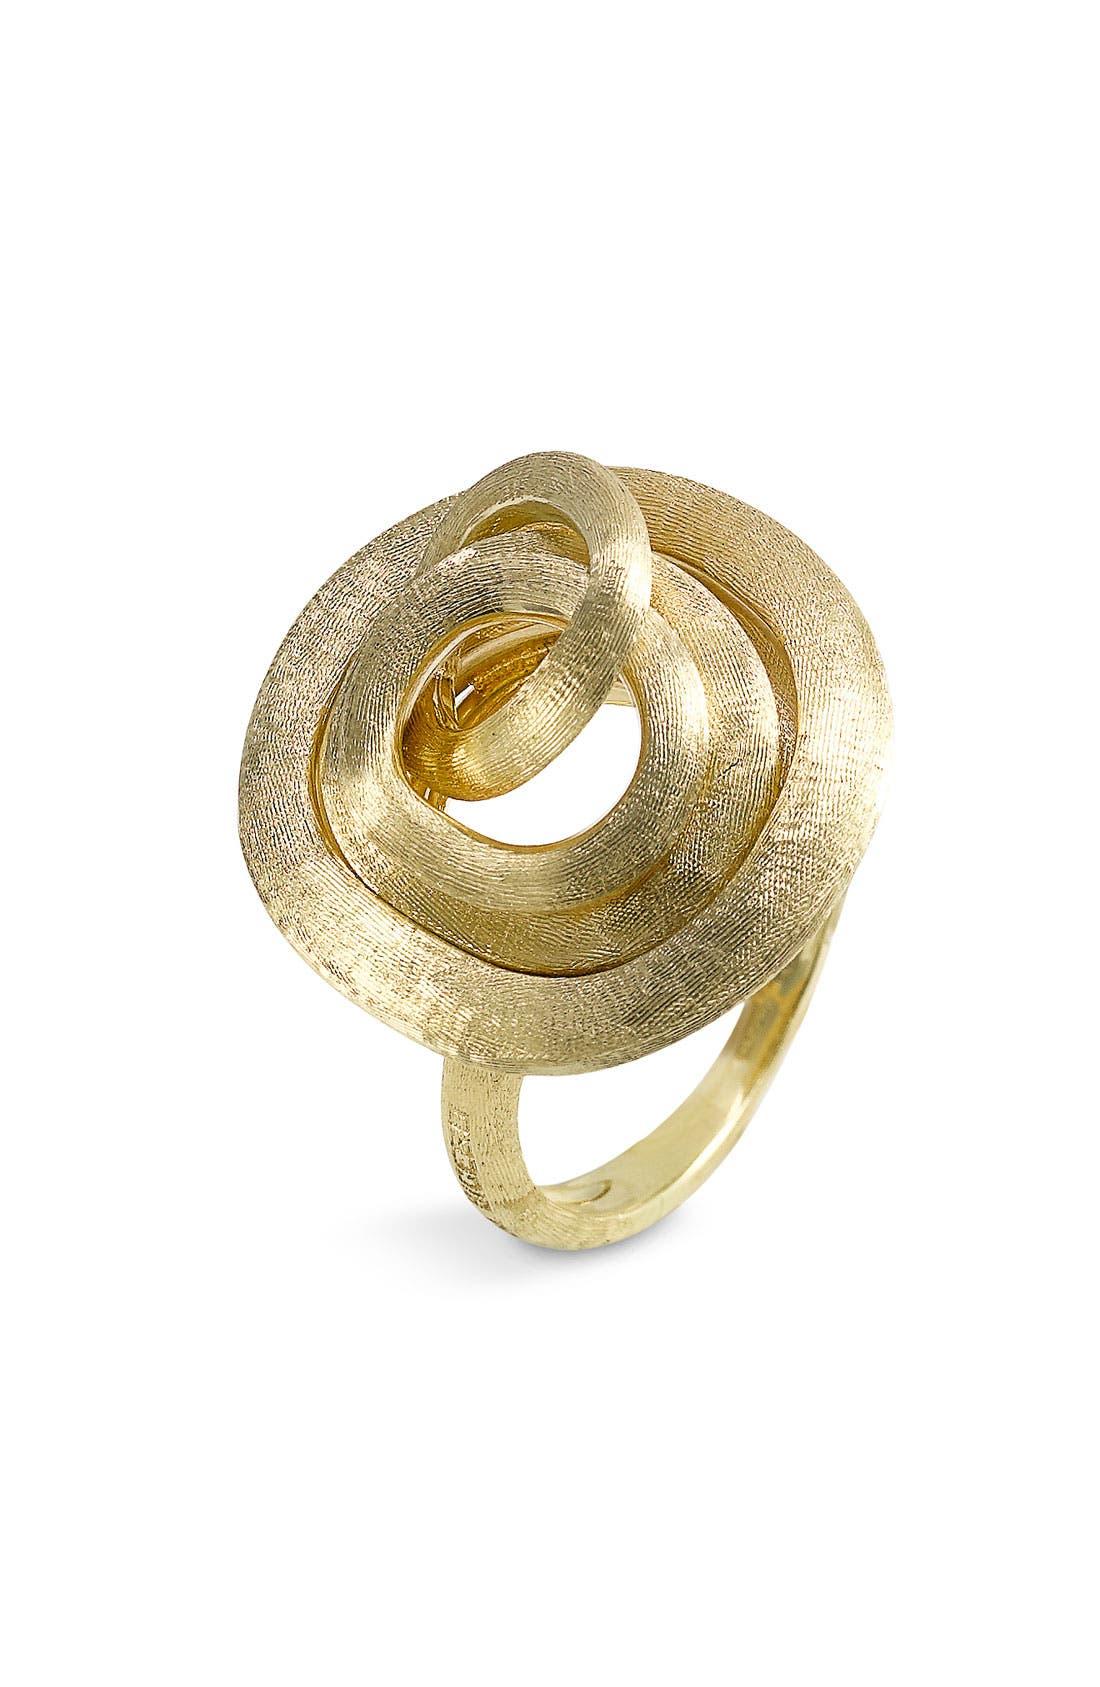 Alternate Image 1 Selected - Marco Bicego 'Jaipur Link' Large Cluster Ring